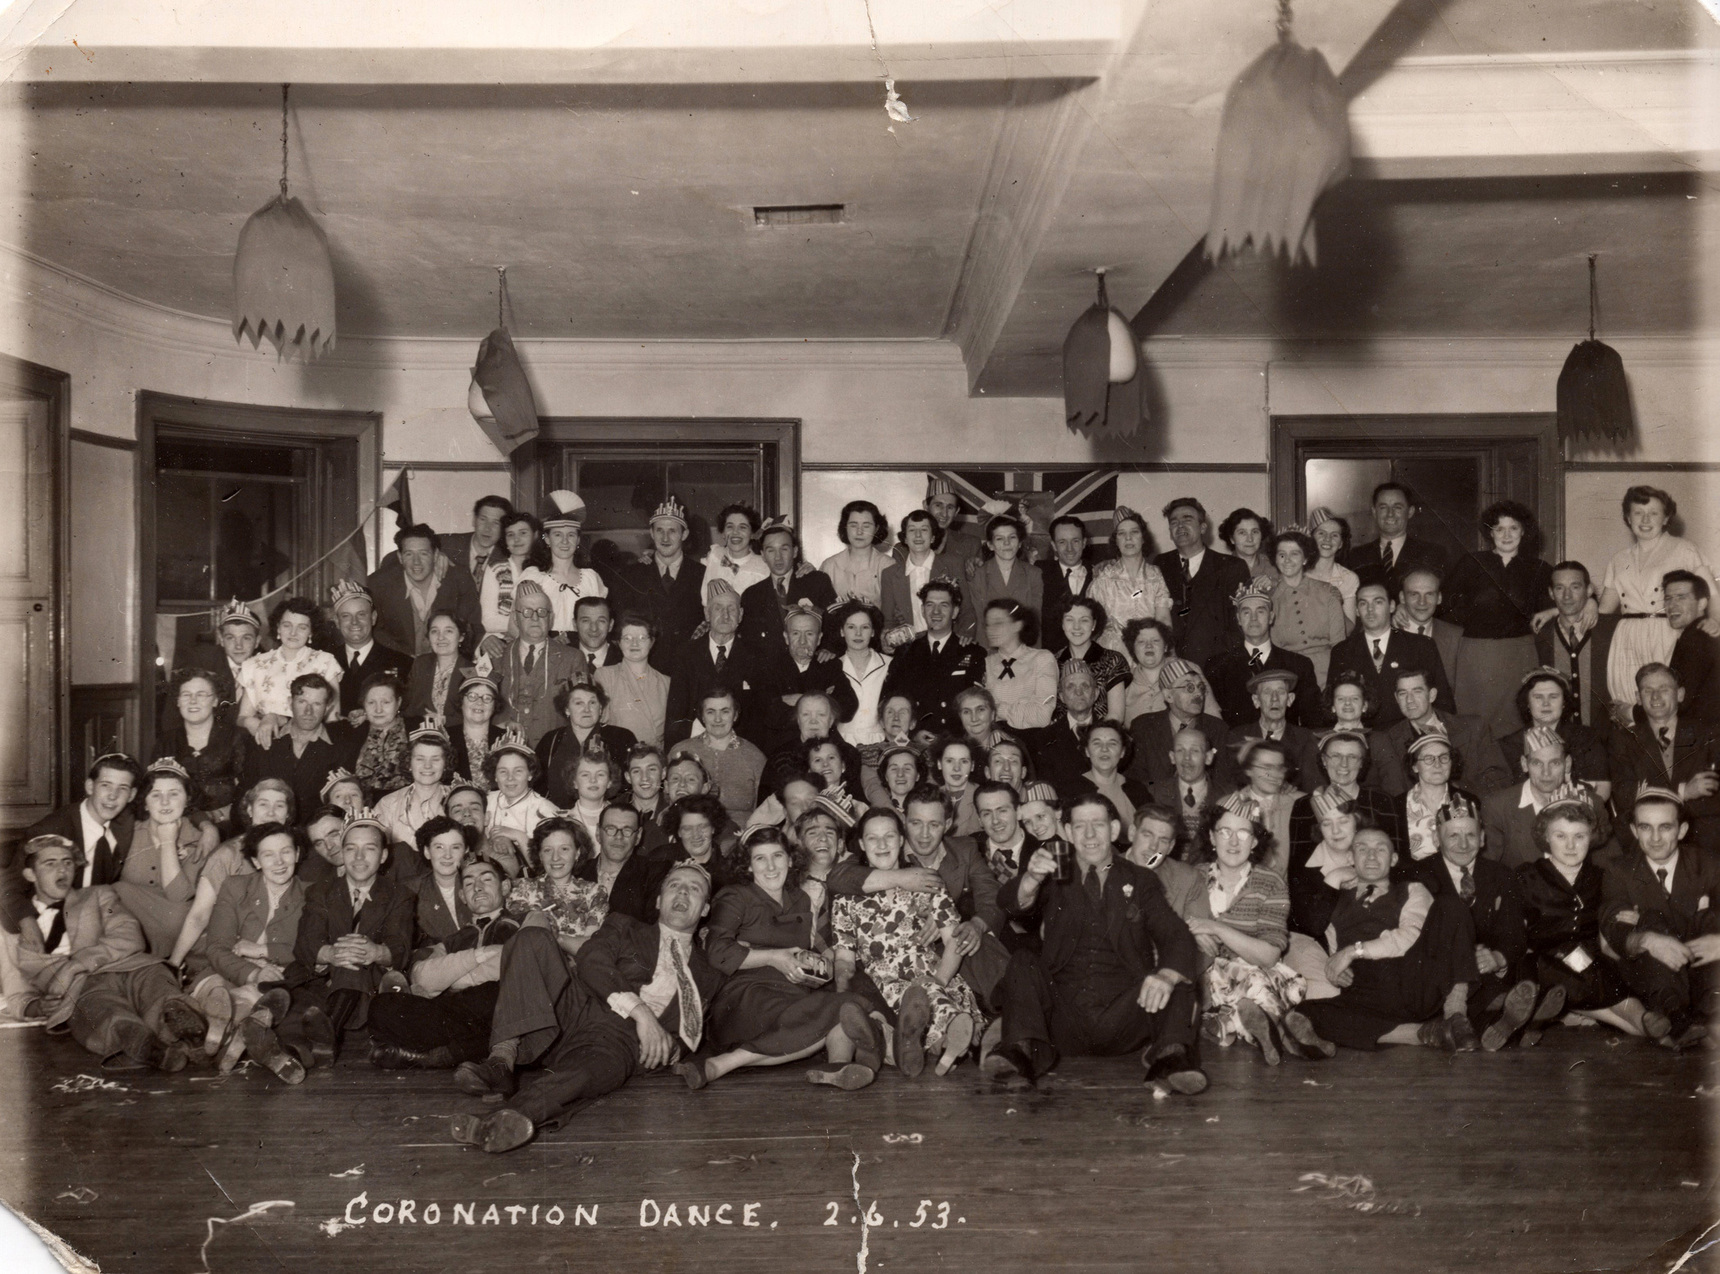 Coronation Day Dance, 2nd June 1953